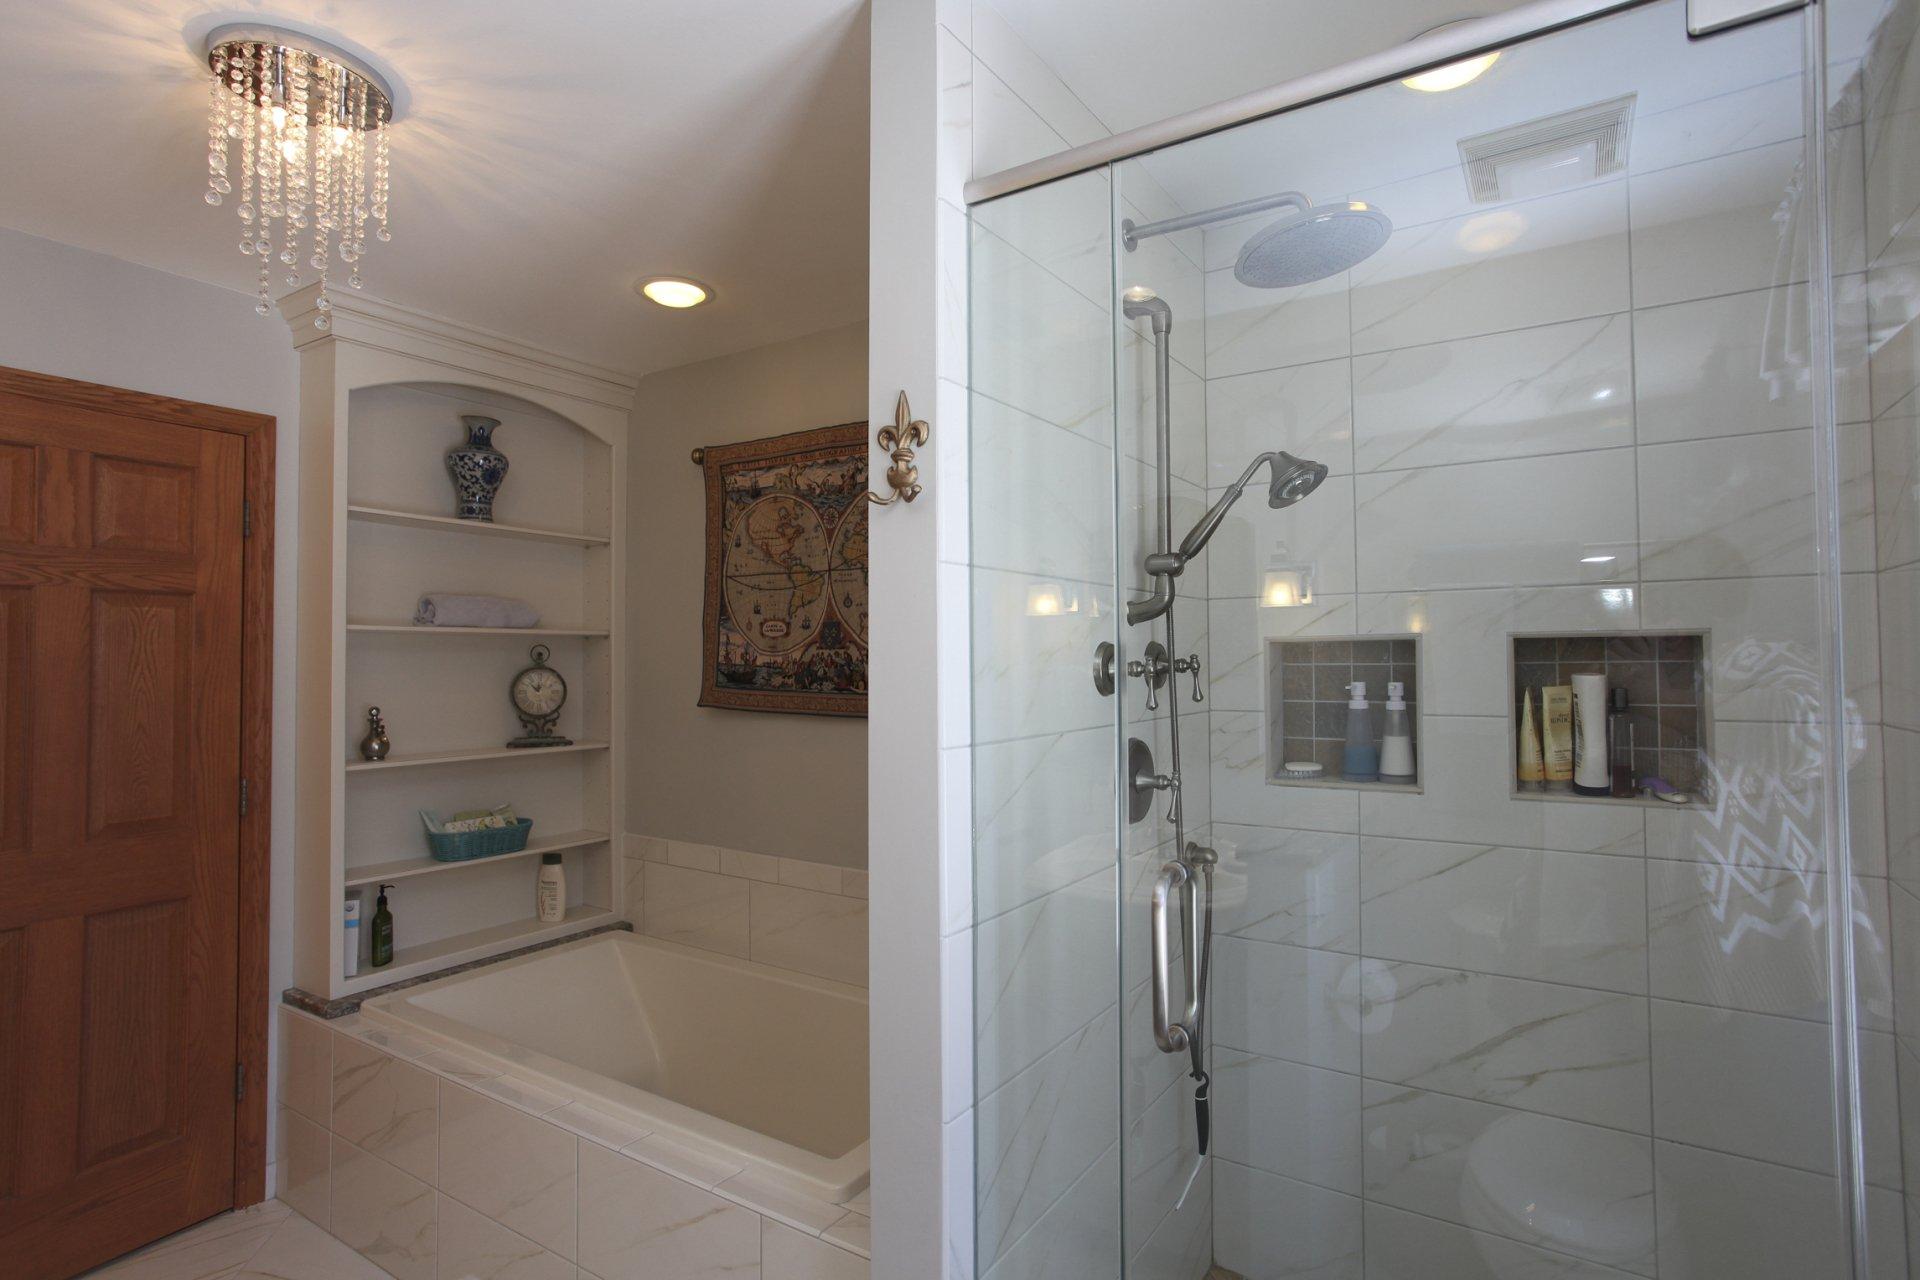 Bathroom remodeling arlington heights il cabinets plus for Bathroom remodeling arlington heights il